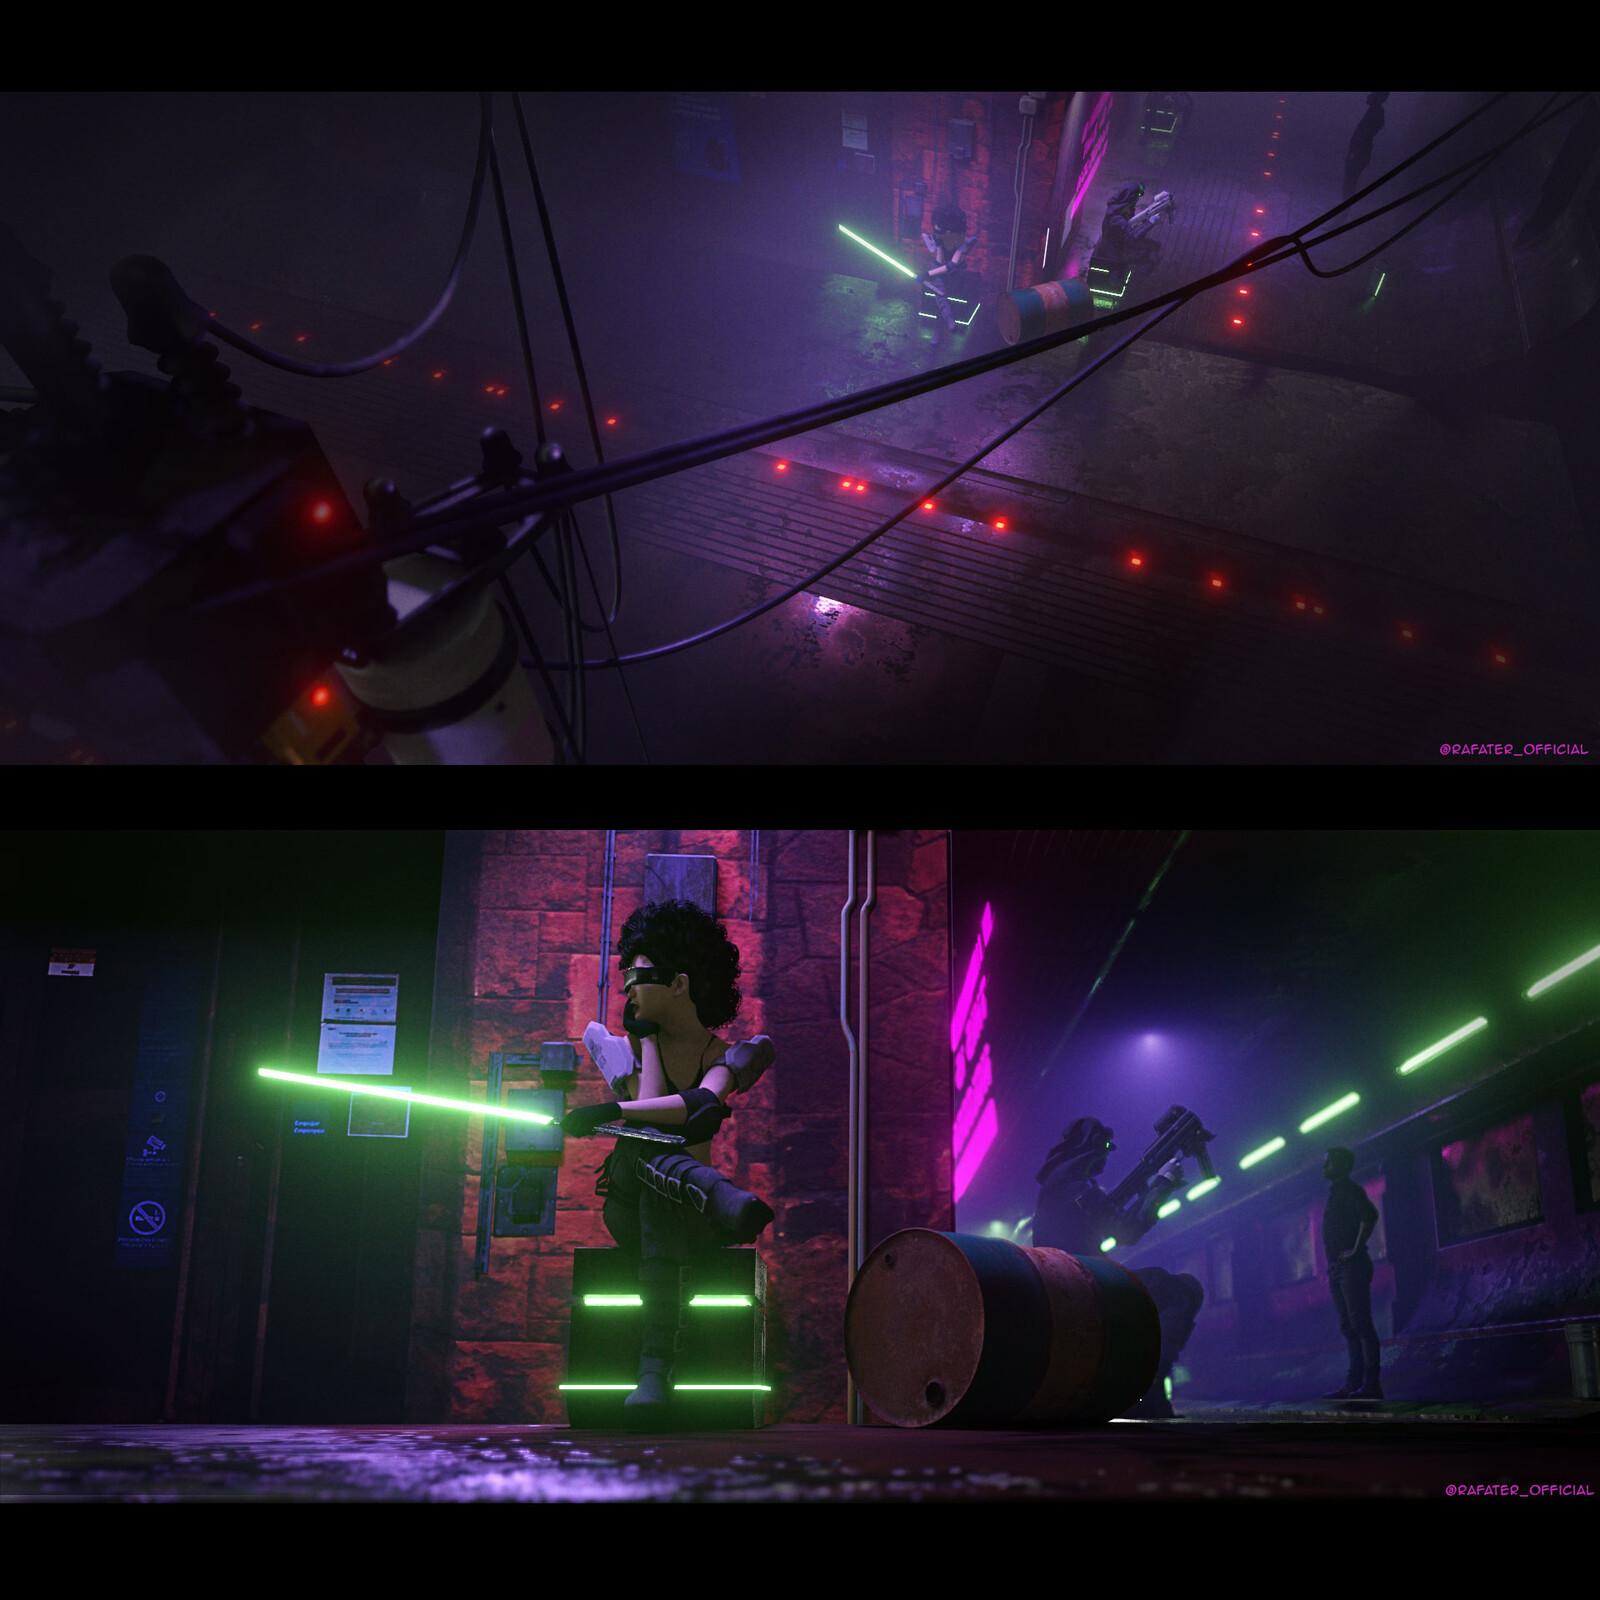 Cyberpunk district